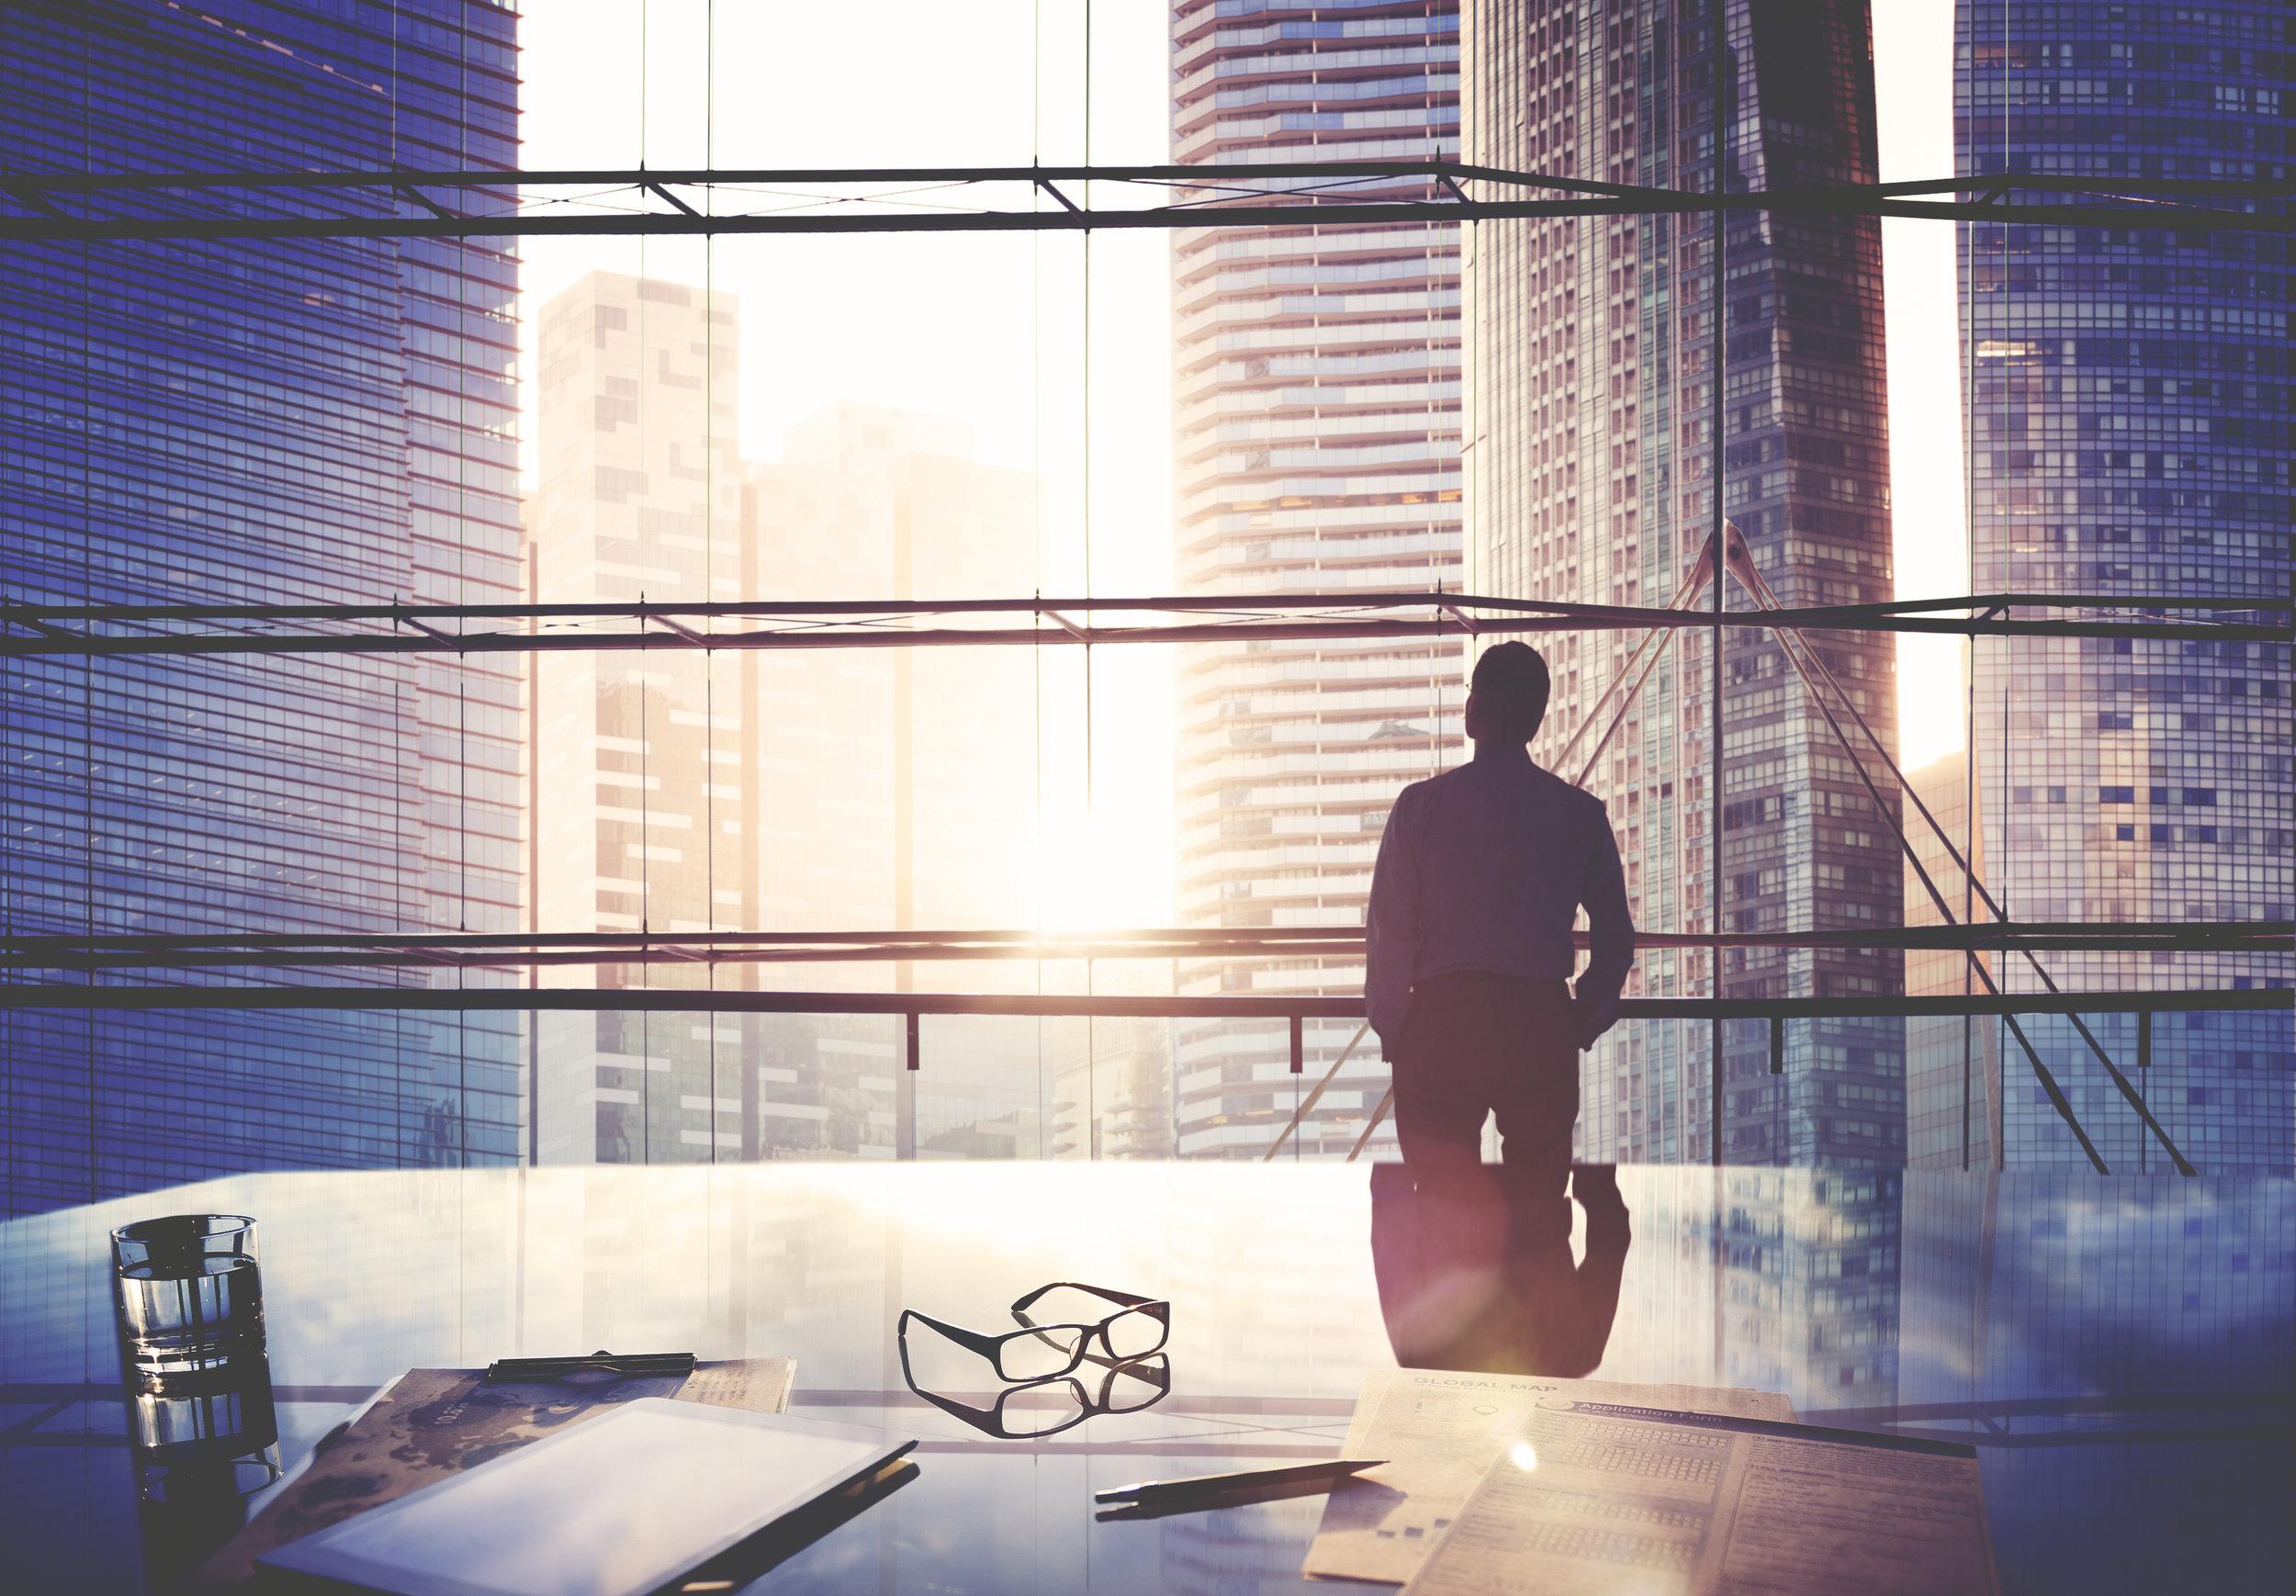 Choosing Between a Corporation and an LLC - February 23, 2018